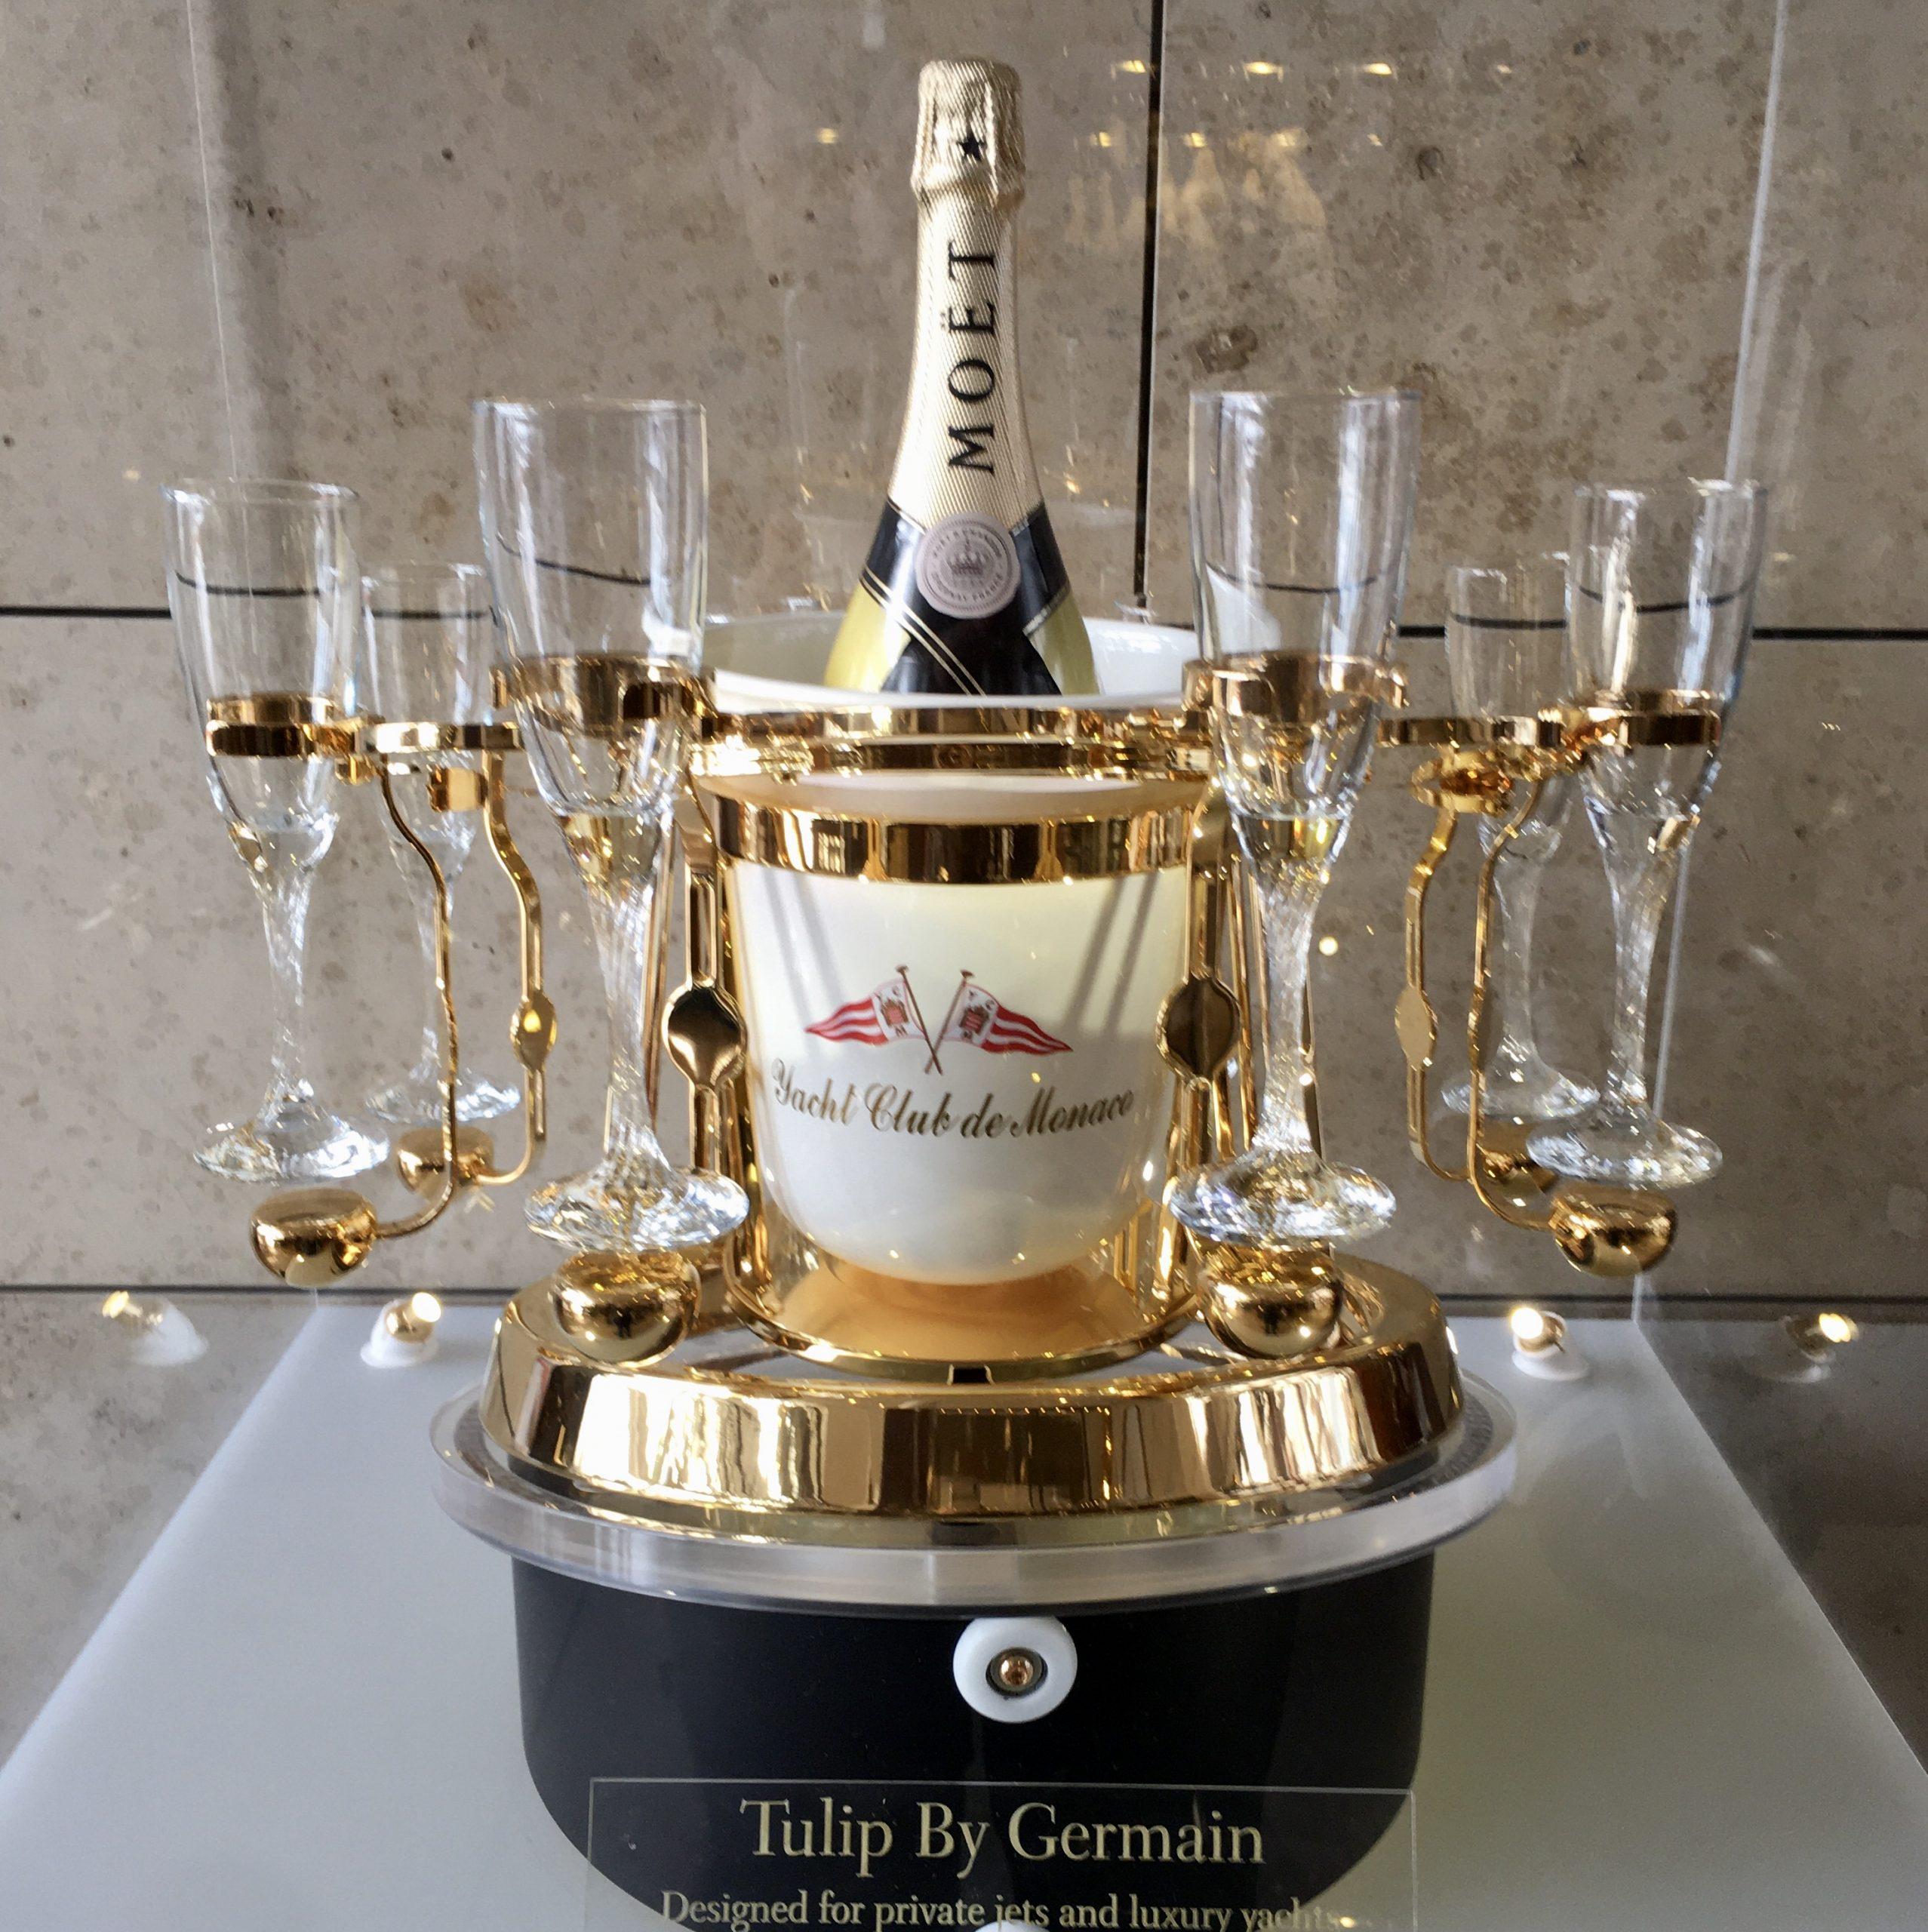 Tulip by germain monaco, yacht club de monaco, écrin champagne